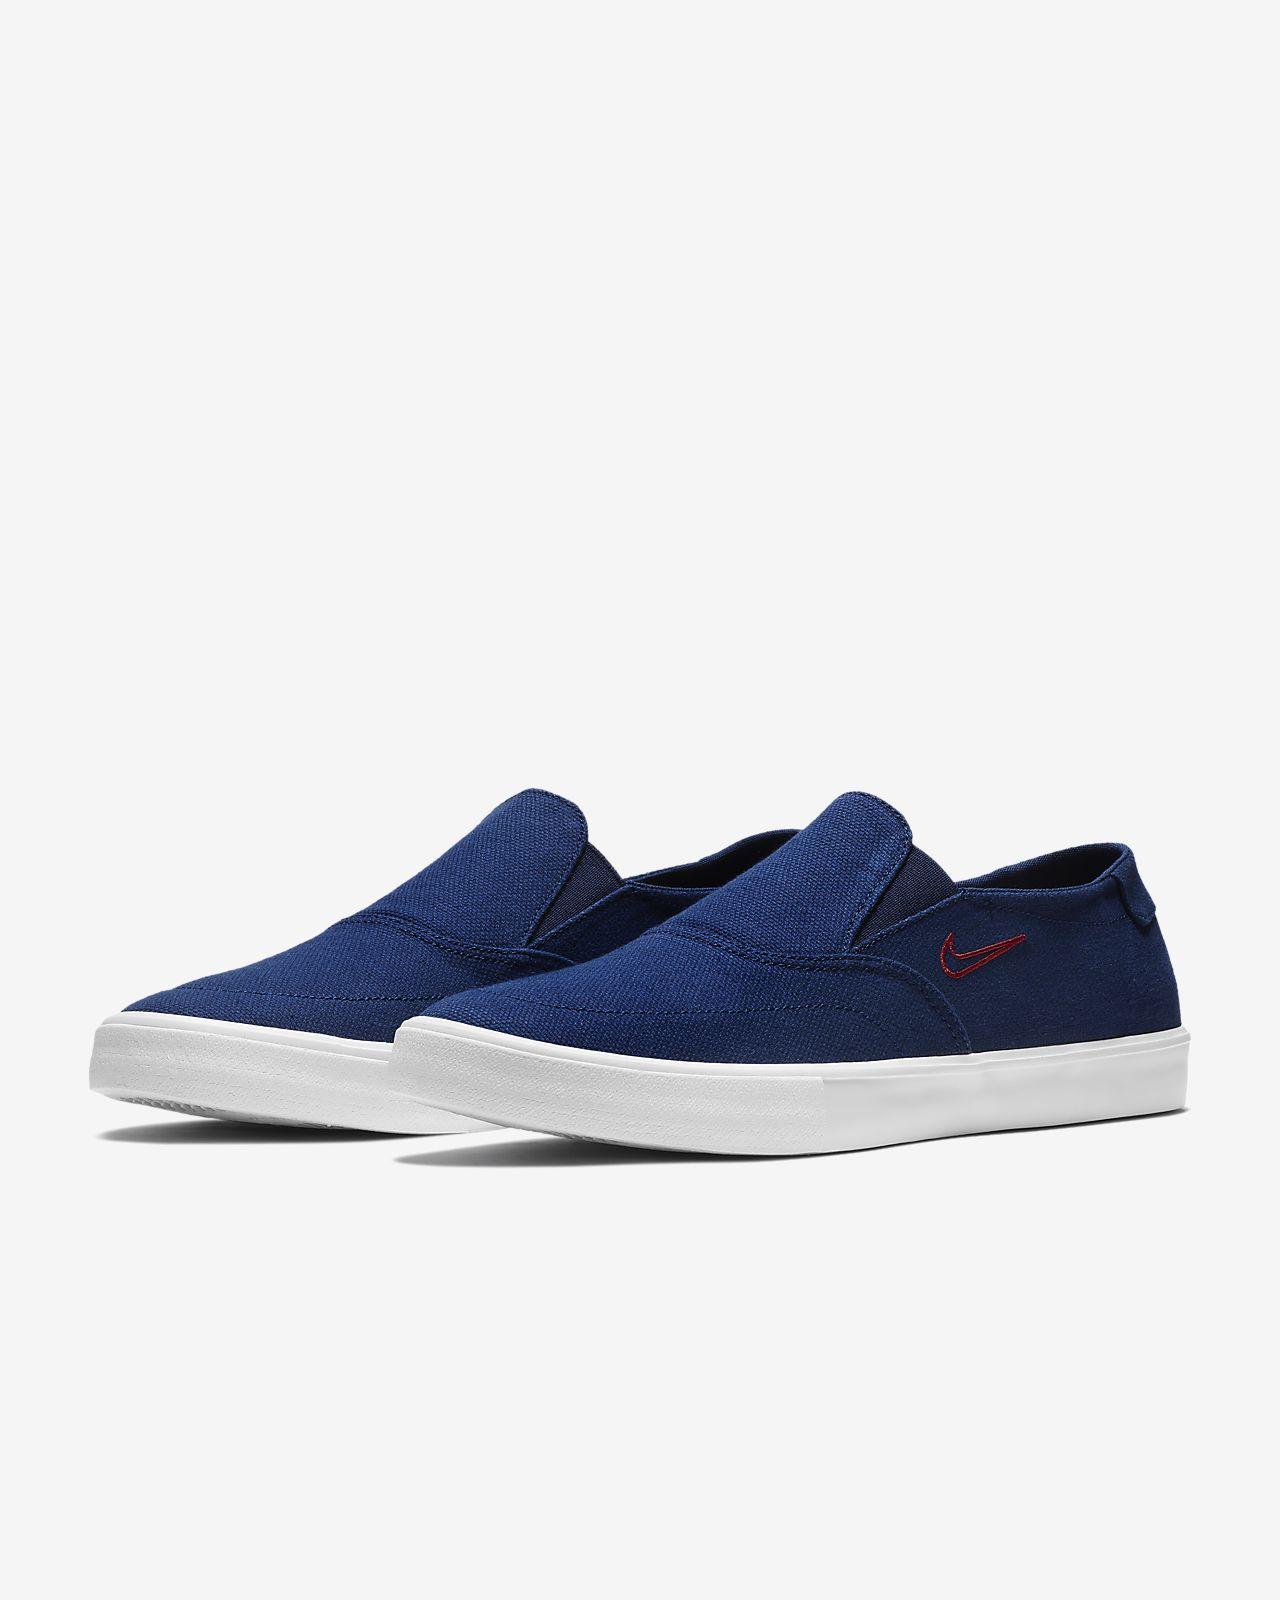 Pánská nazouvací skateboardová bota Nike SB Portmore II Solarsoft ... f85eee5ecf